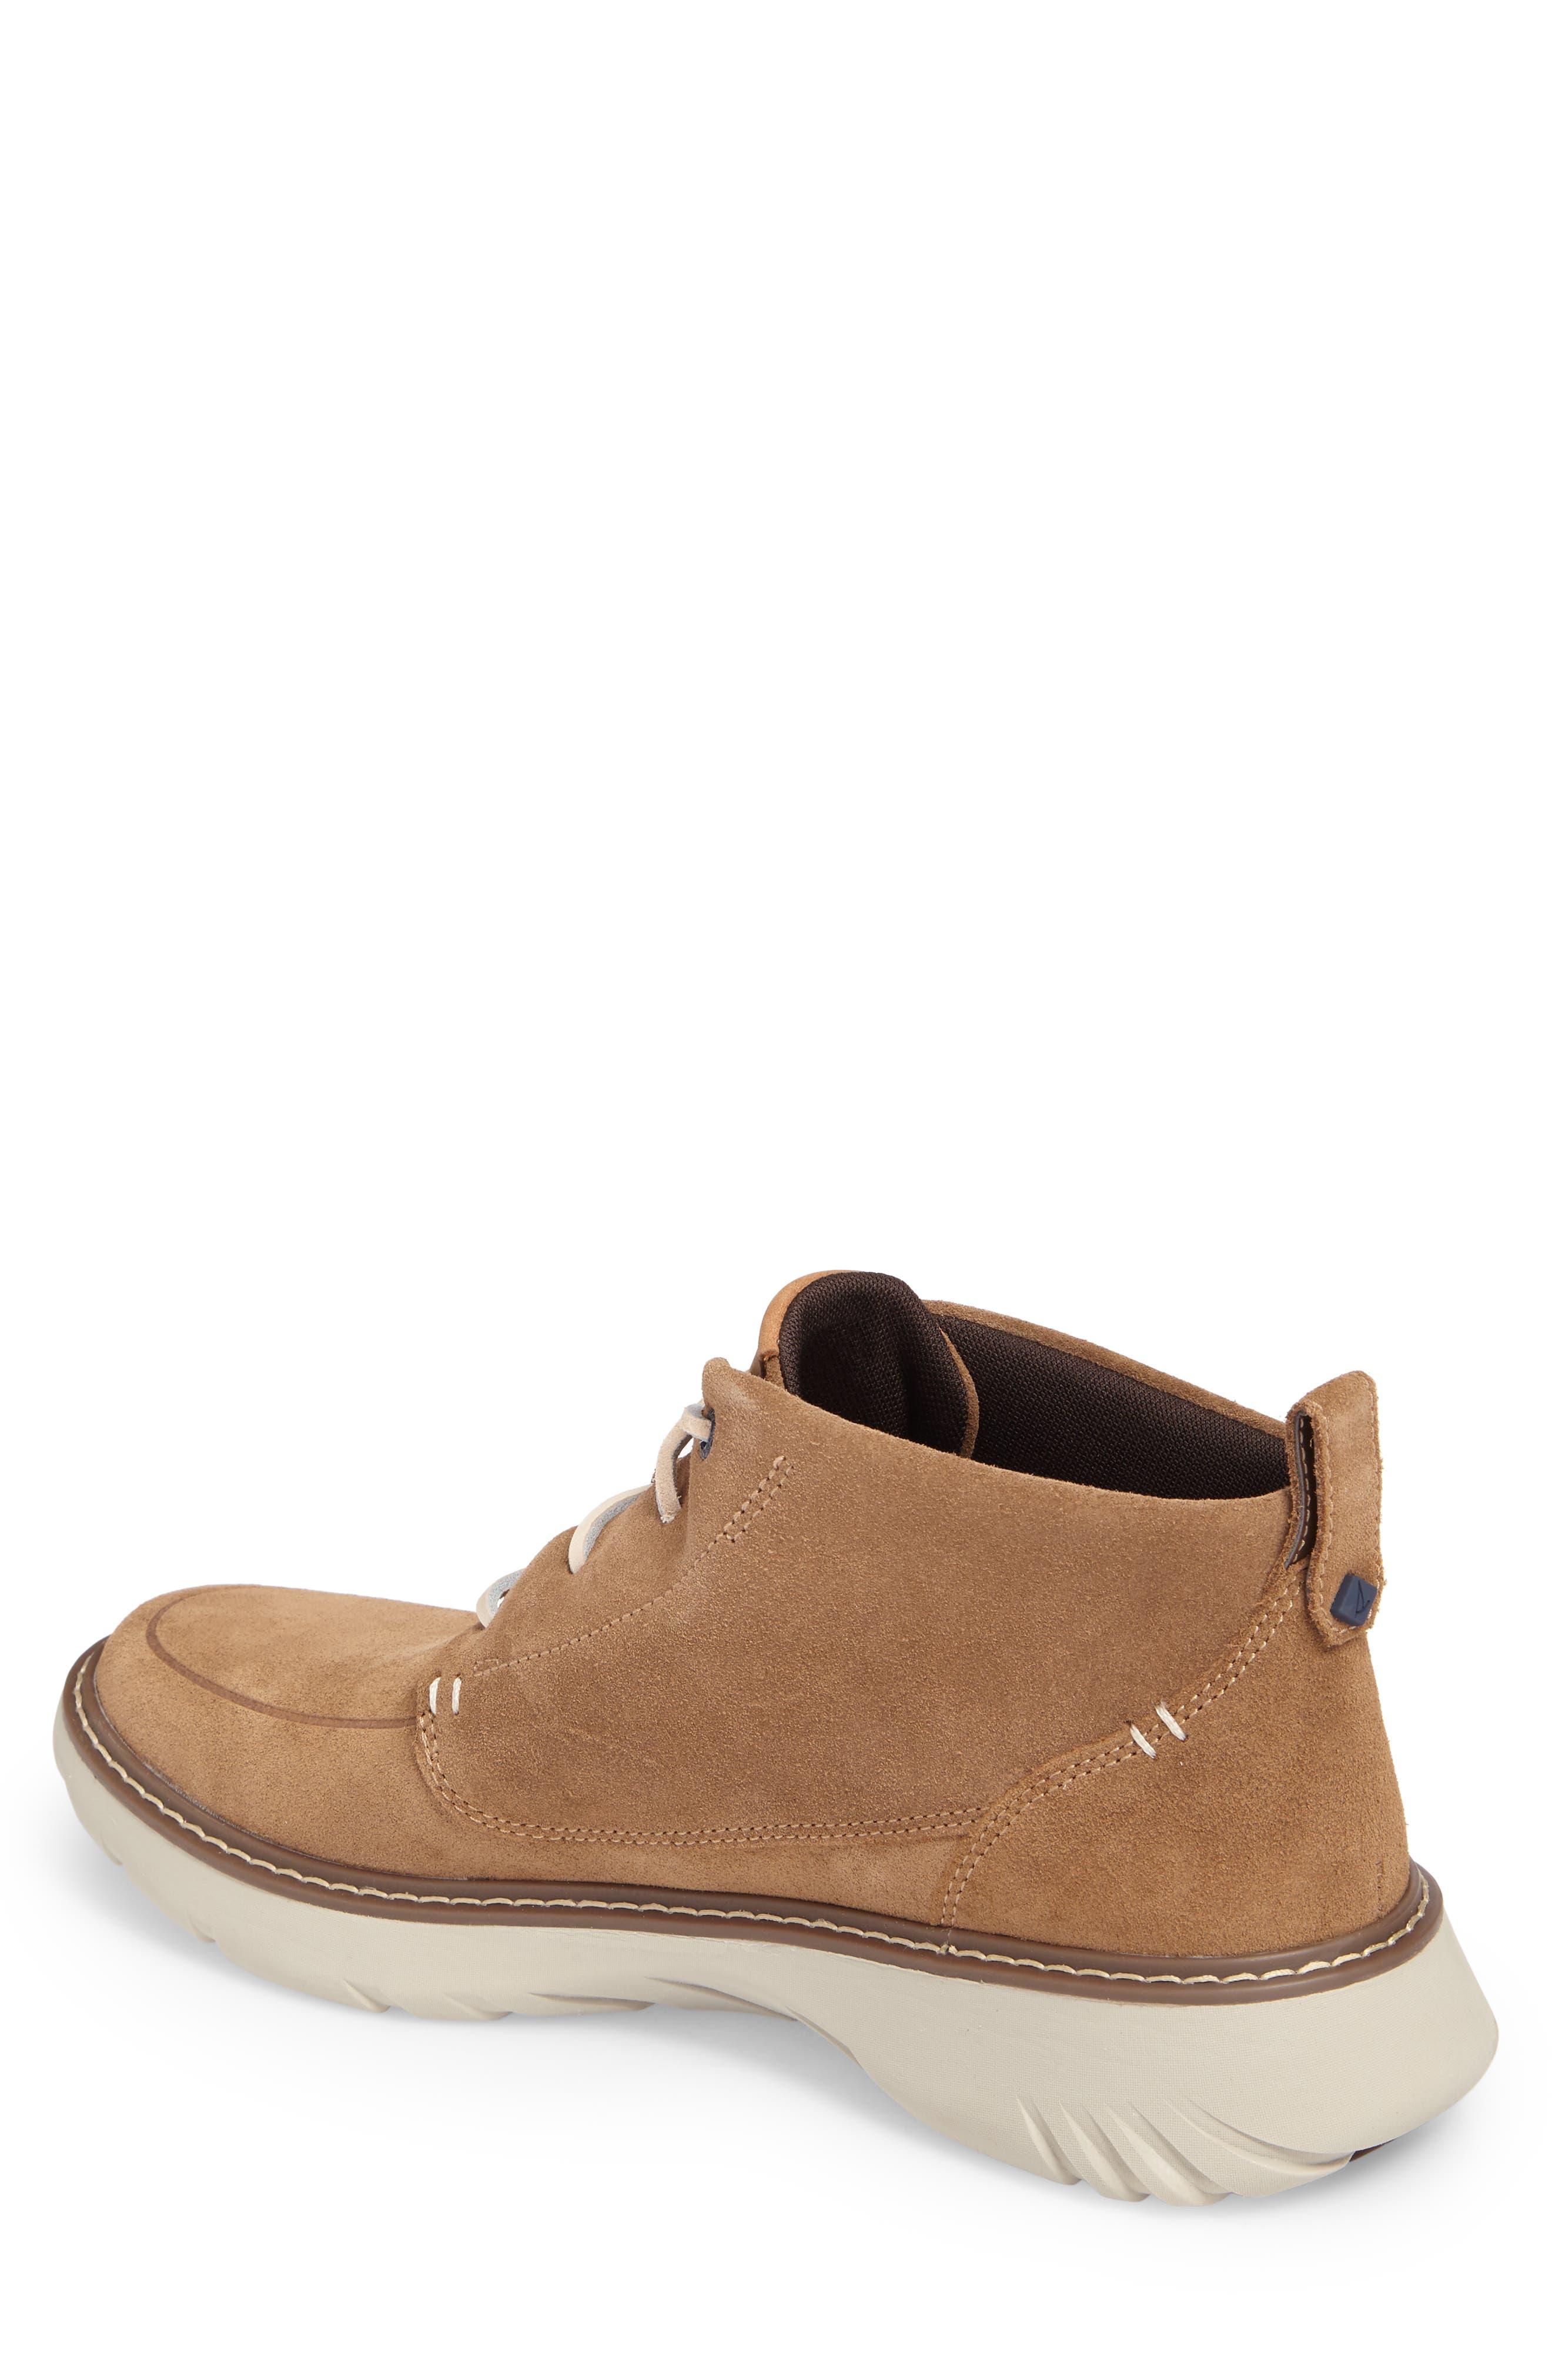 Element Chukka Boot,                             Alternate thumbnail 2, color,                             Caramel Leather